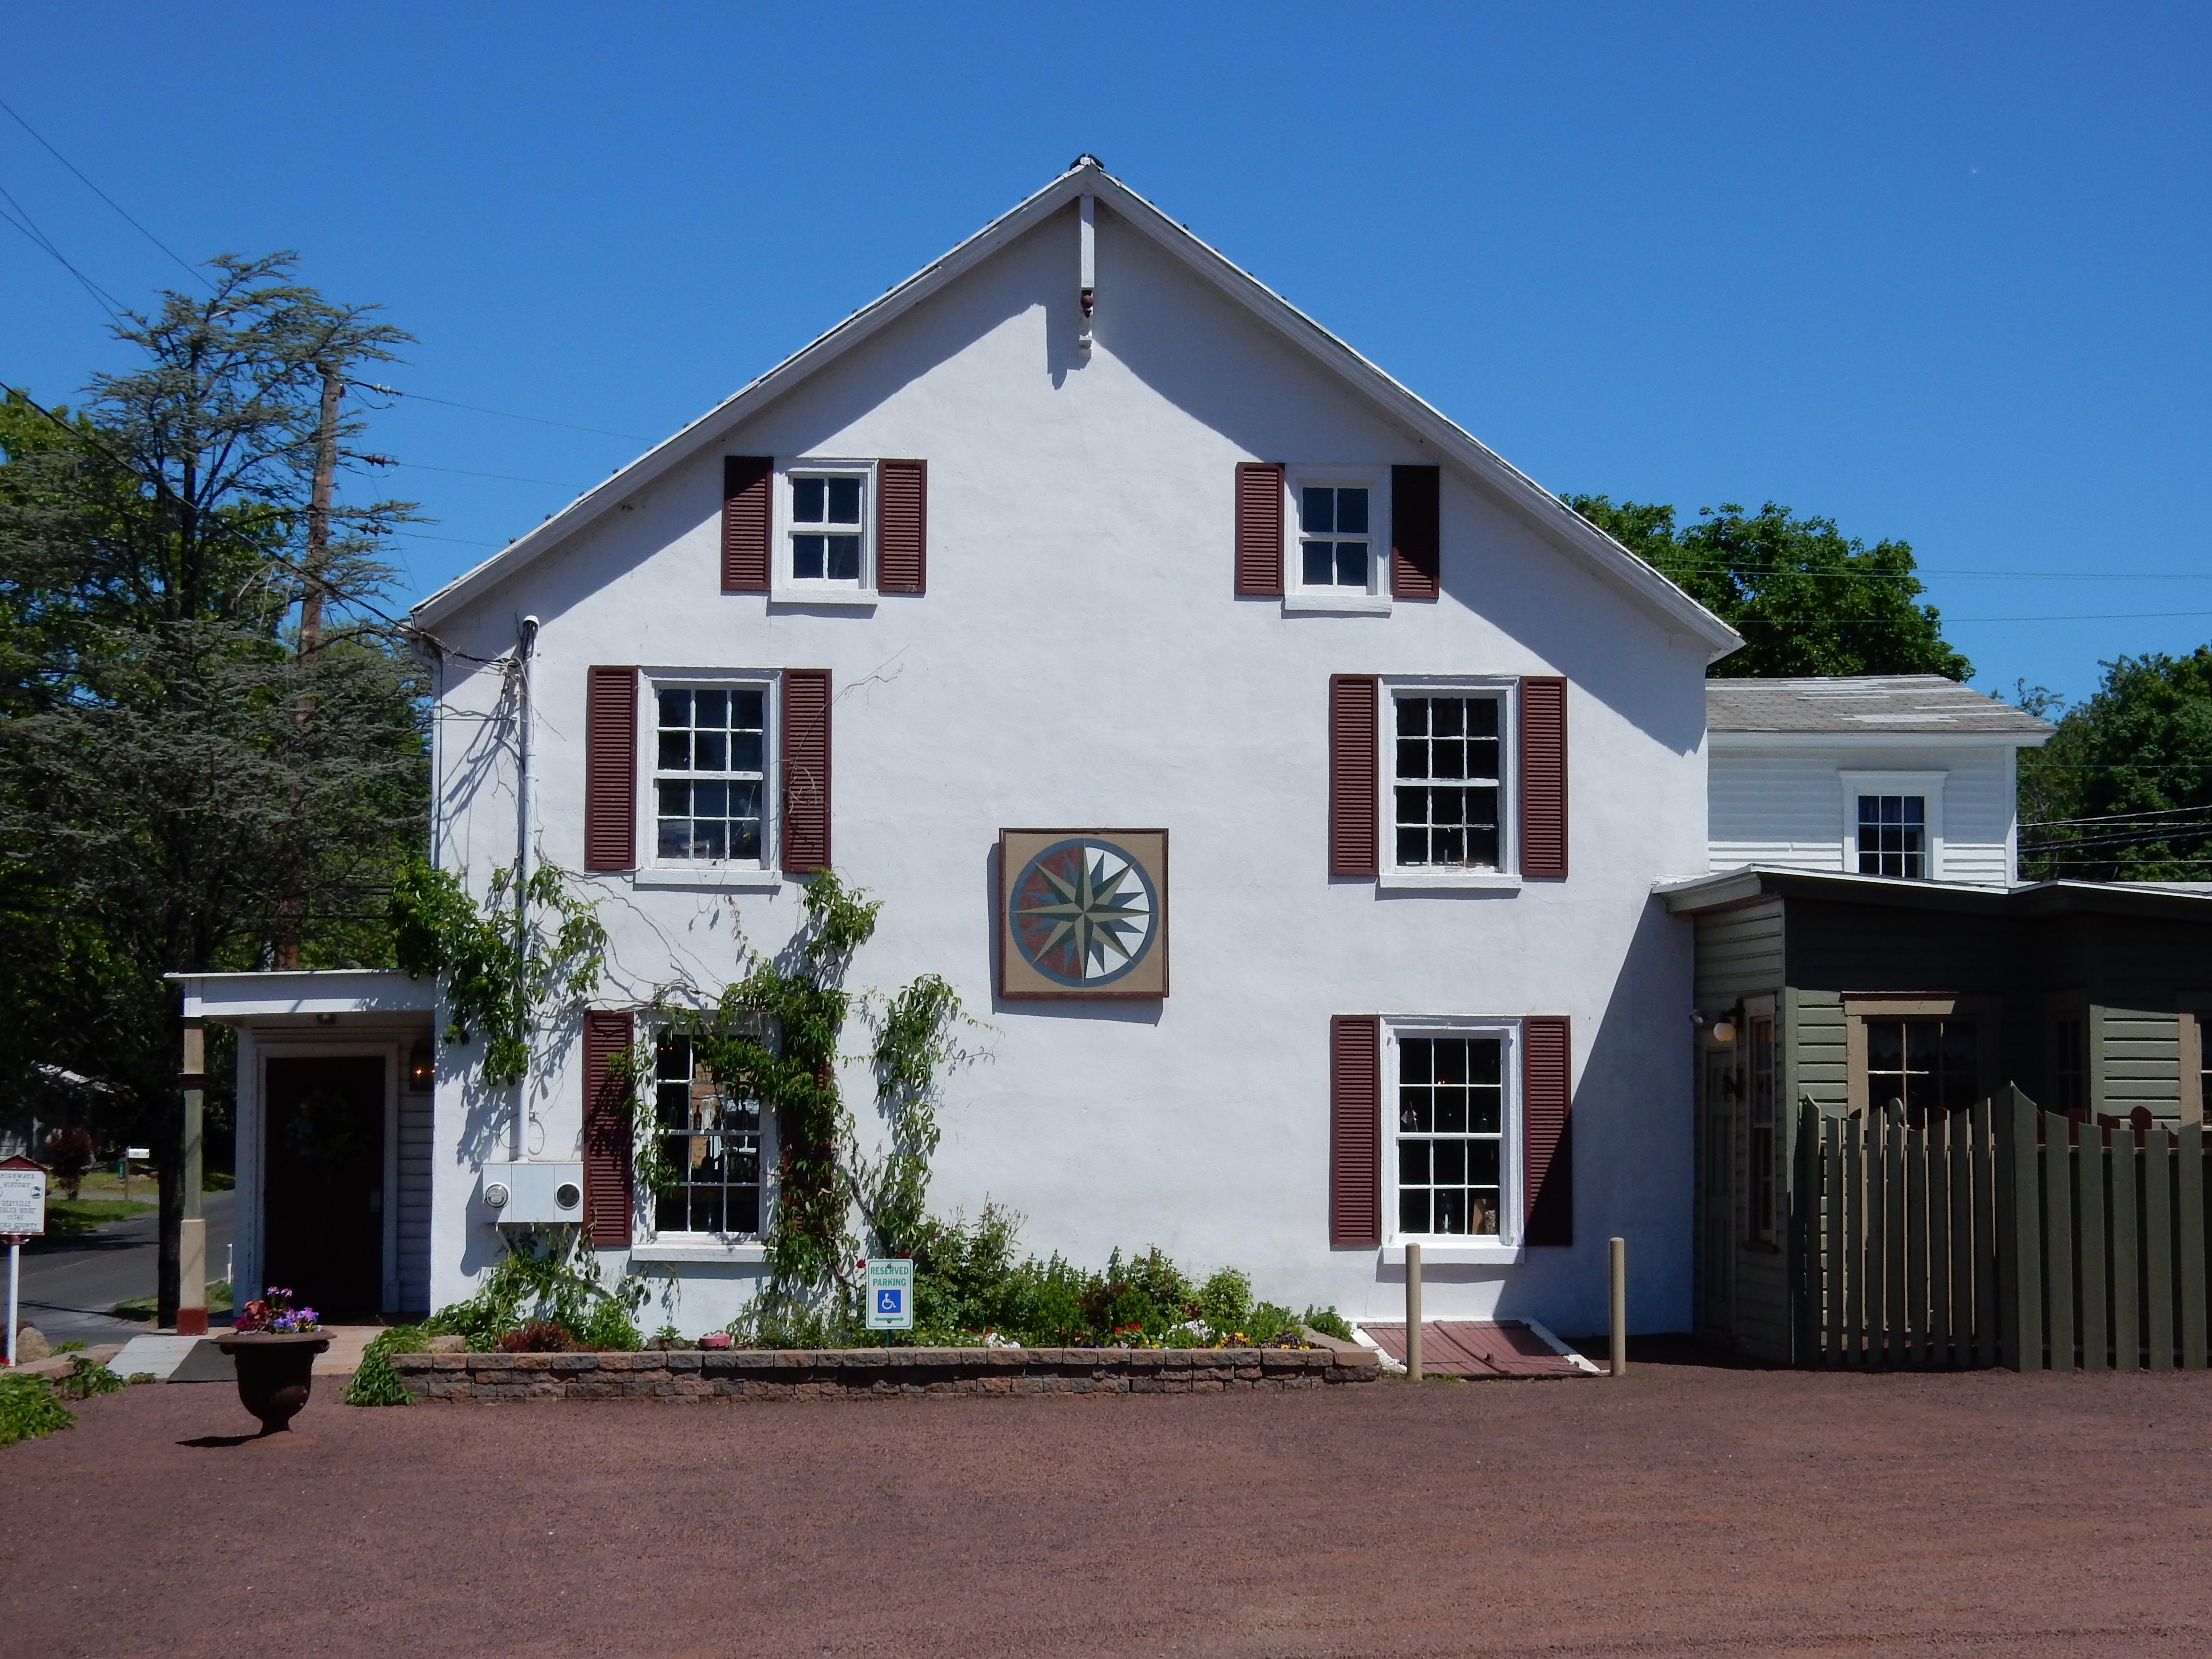 File:Jamison Publick House, Geryville PA 01.JPG